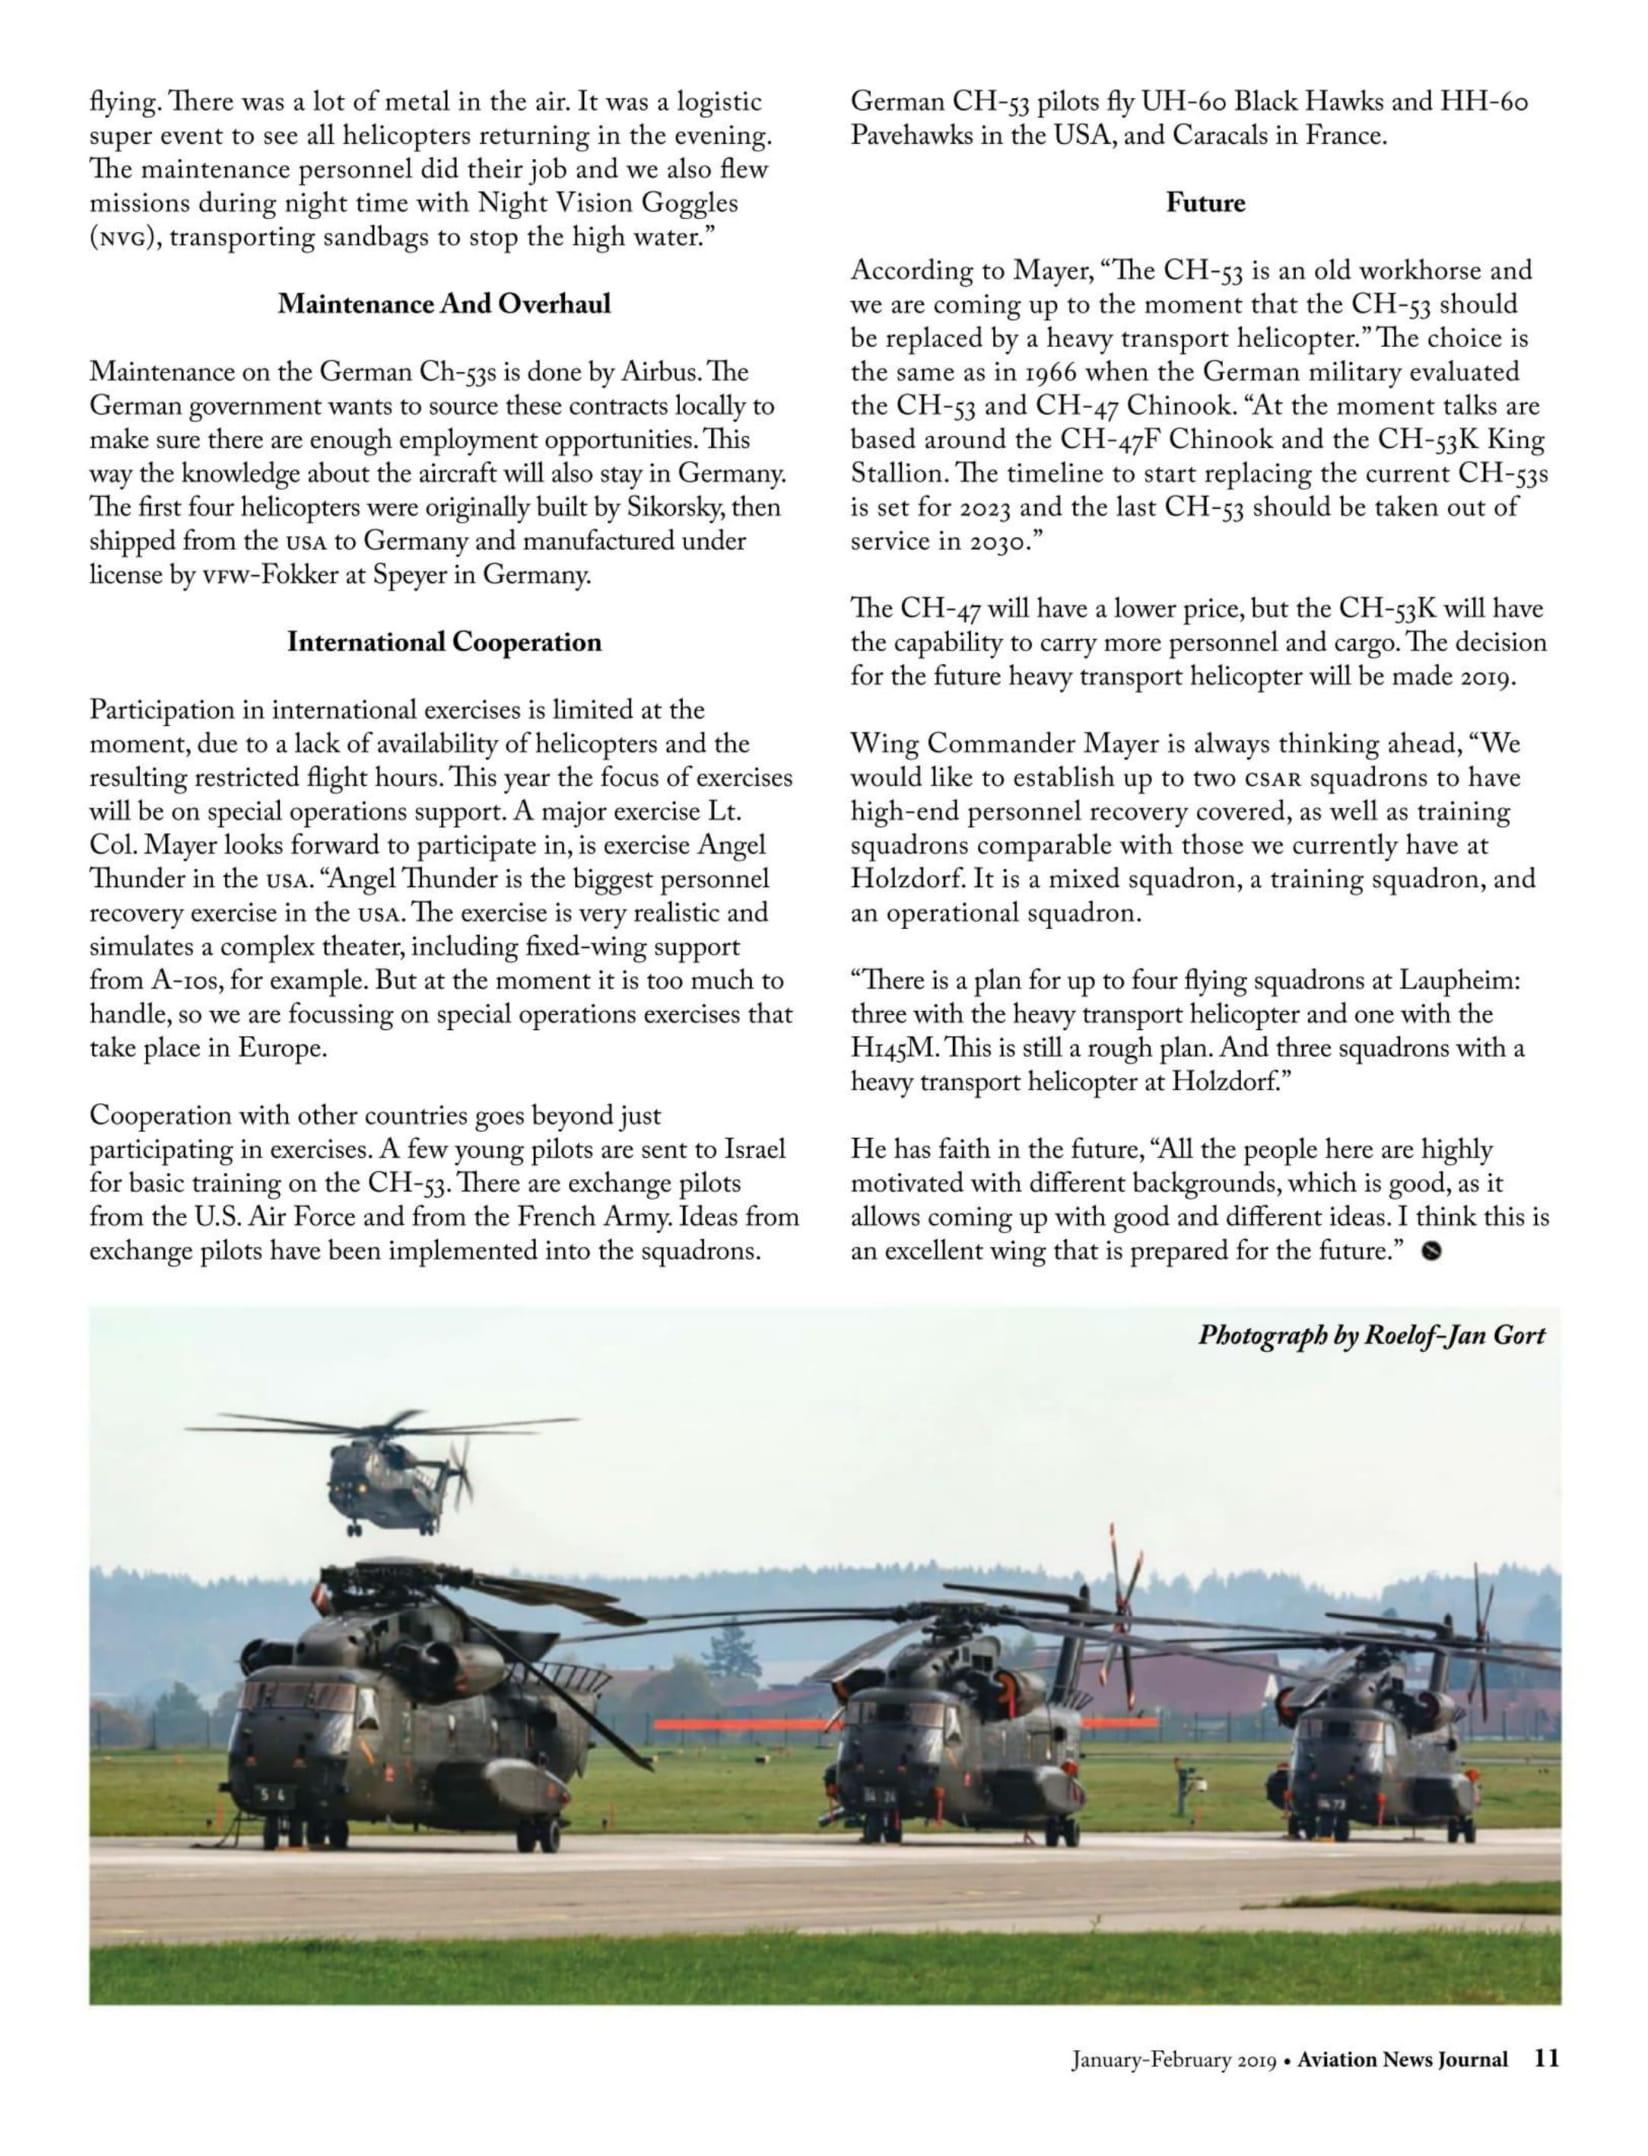 Aviation News Journal (Canada)_CH53s of the HSG 64, Laupheim AB-5